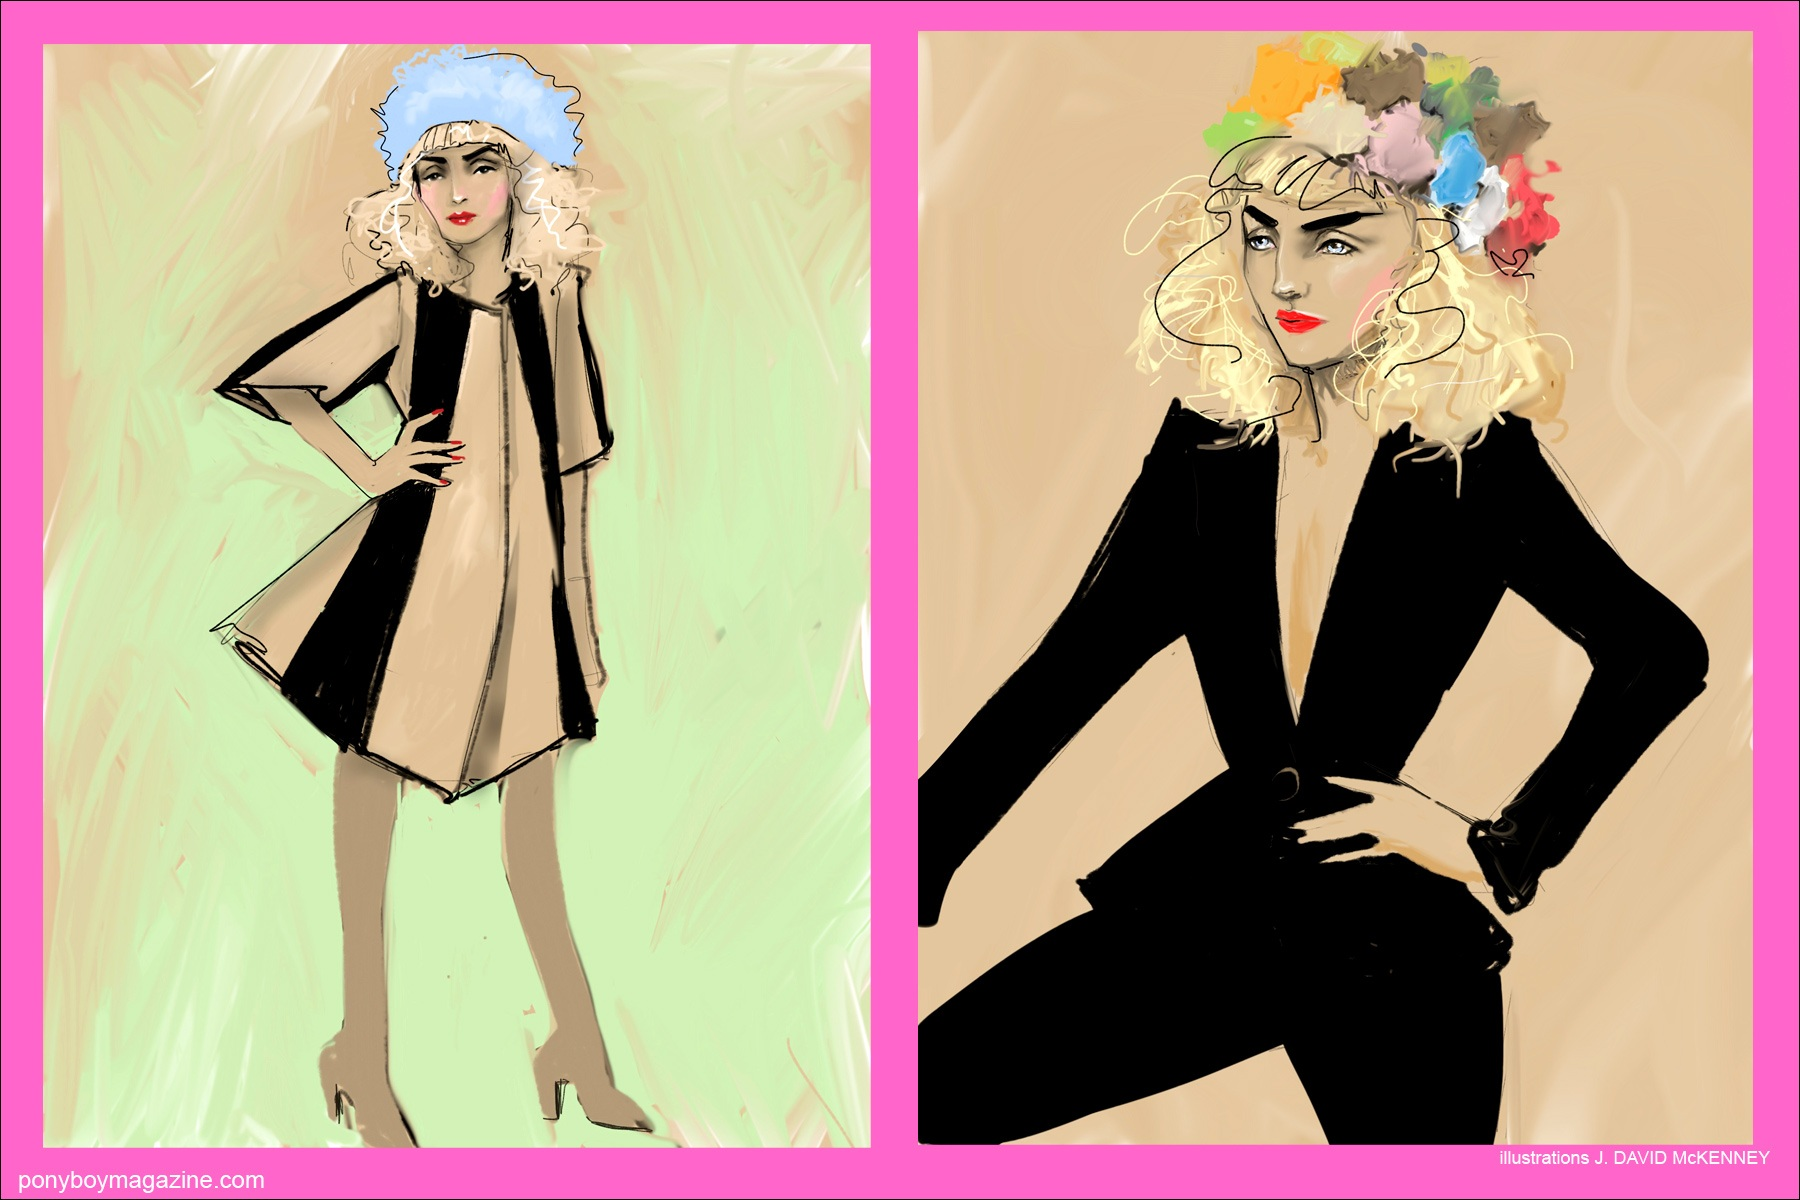 Illustrations of beautiful model Stella Rose Saint Clair for Ponyboy Magazine New York City.